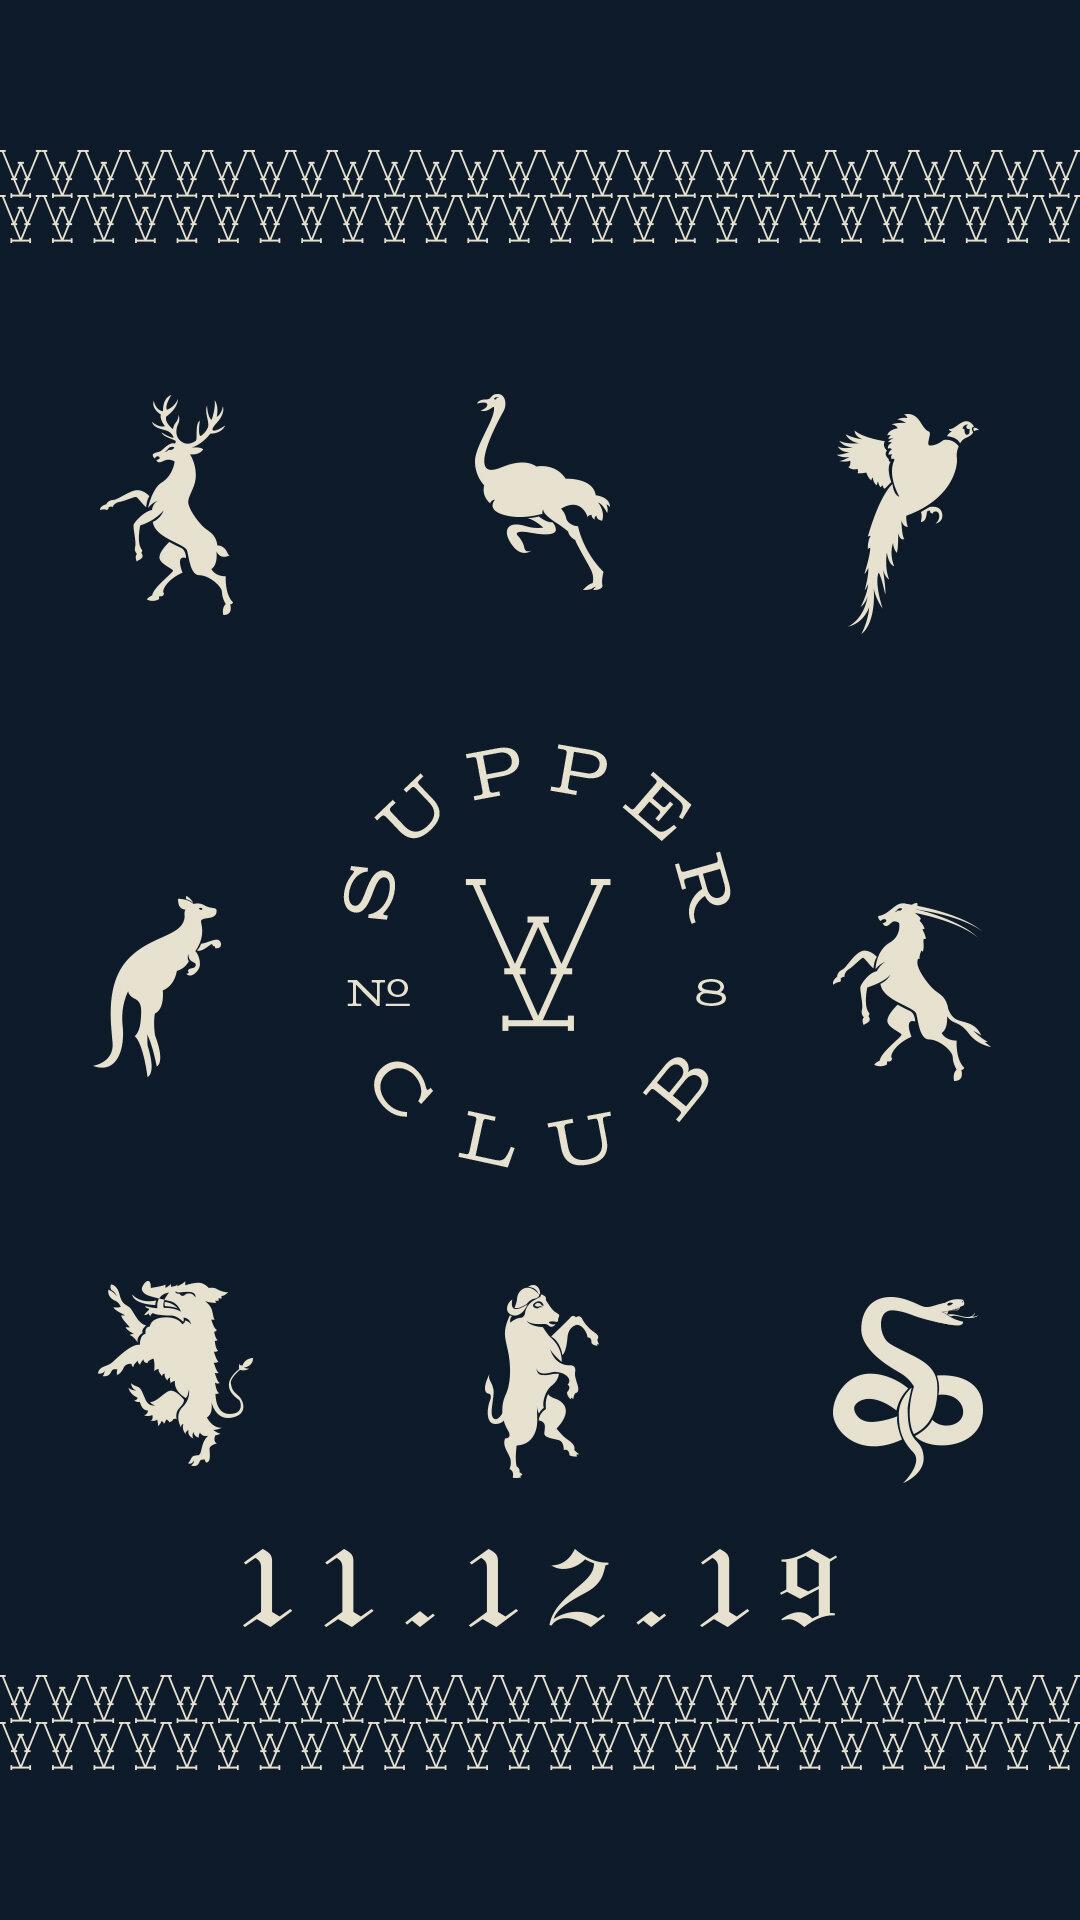 WK_SupperClub8_BannersStory_10 (1).jpg